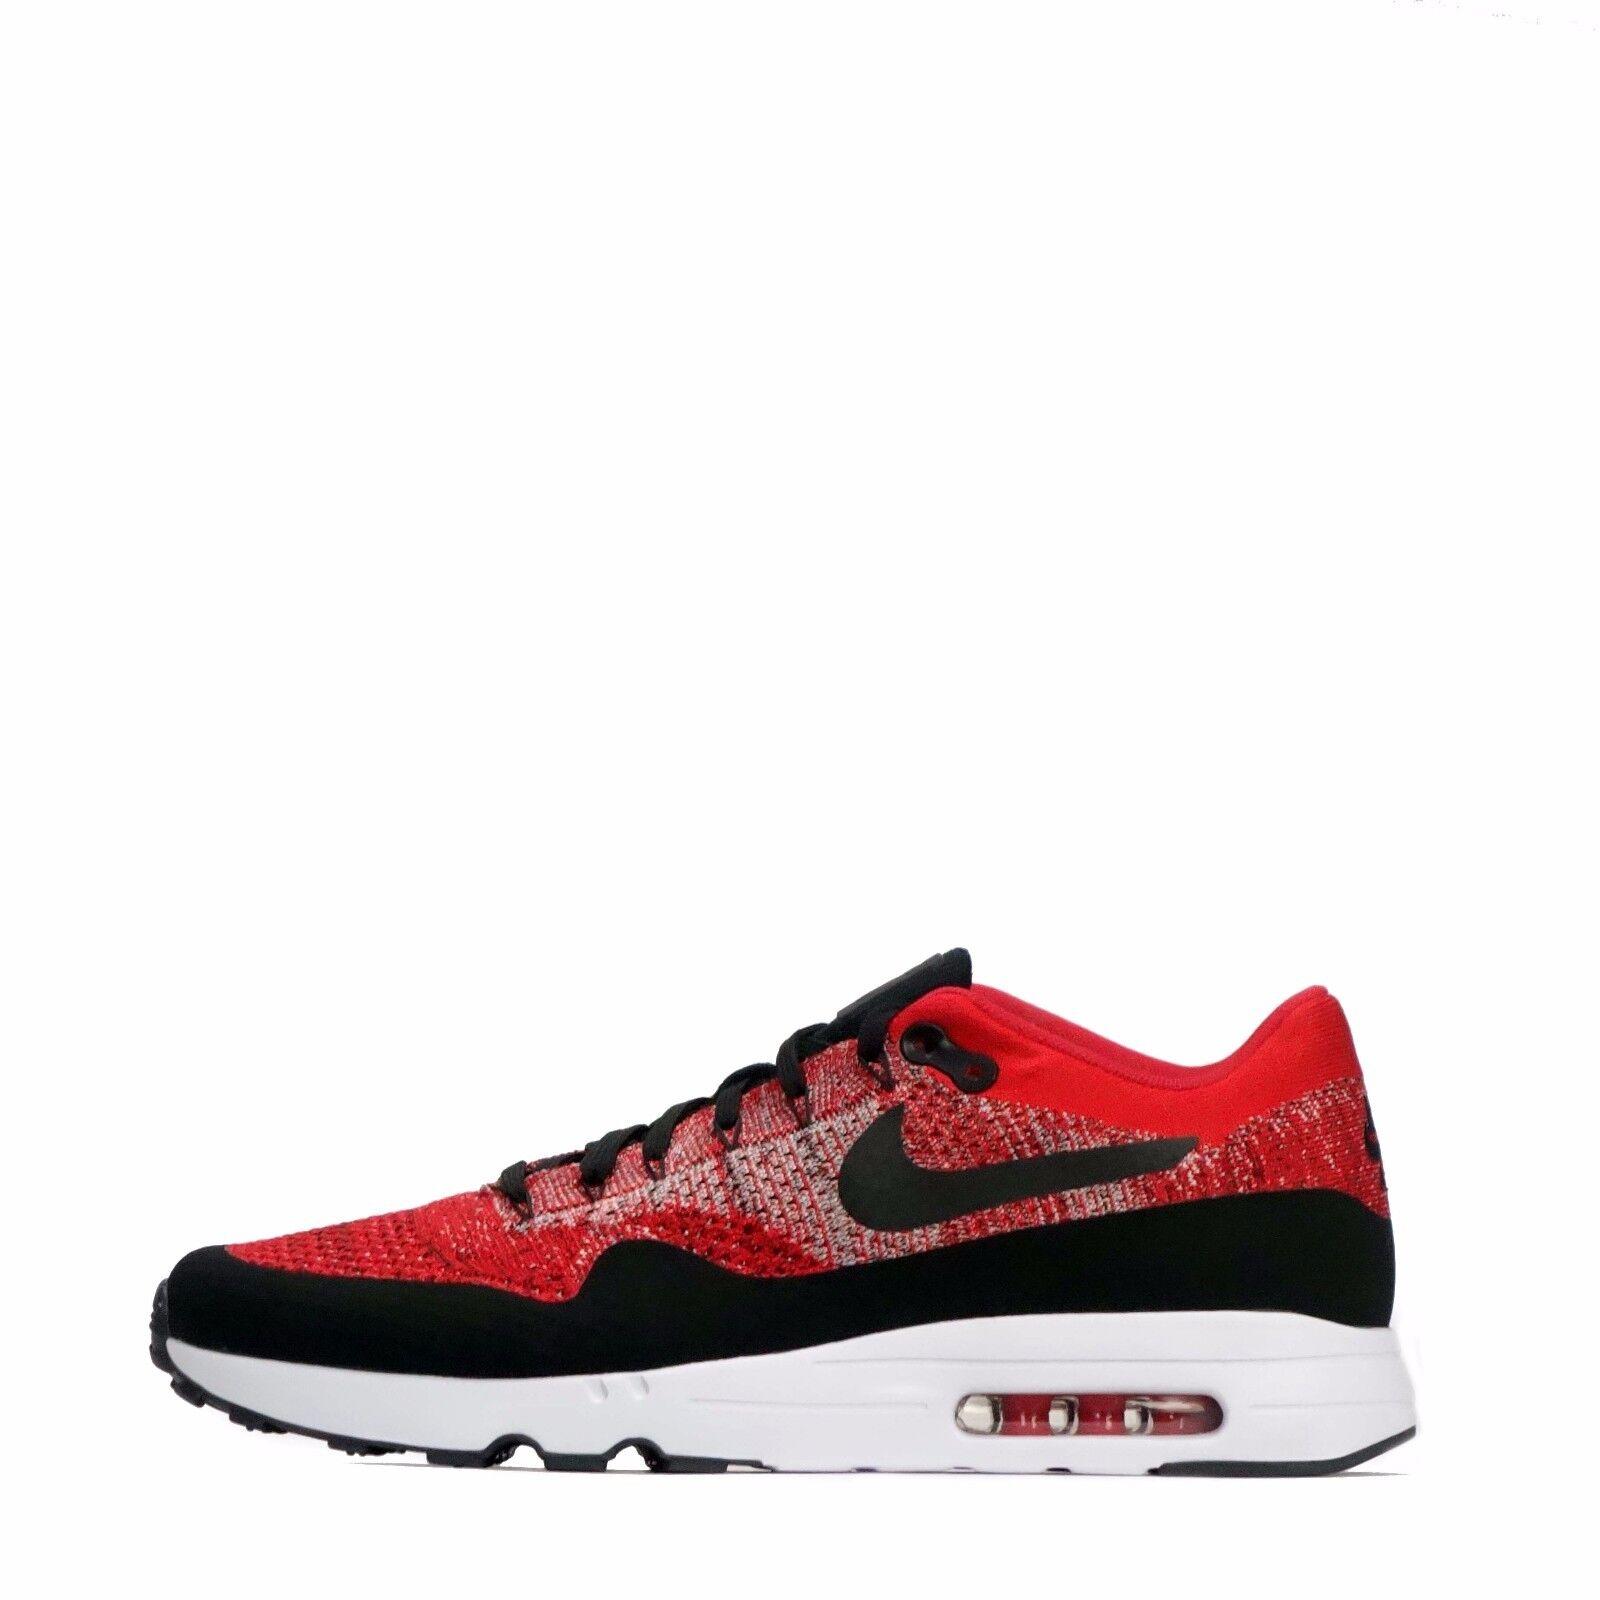 Max 1 Ultra Nike 2.0 Nike Ultra Air Flyknit Para hombres Zapatos Universidad Rojo/Negro 83759f